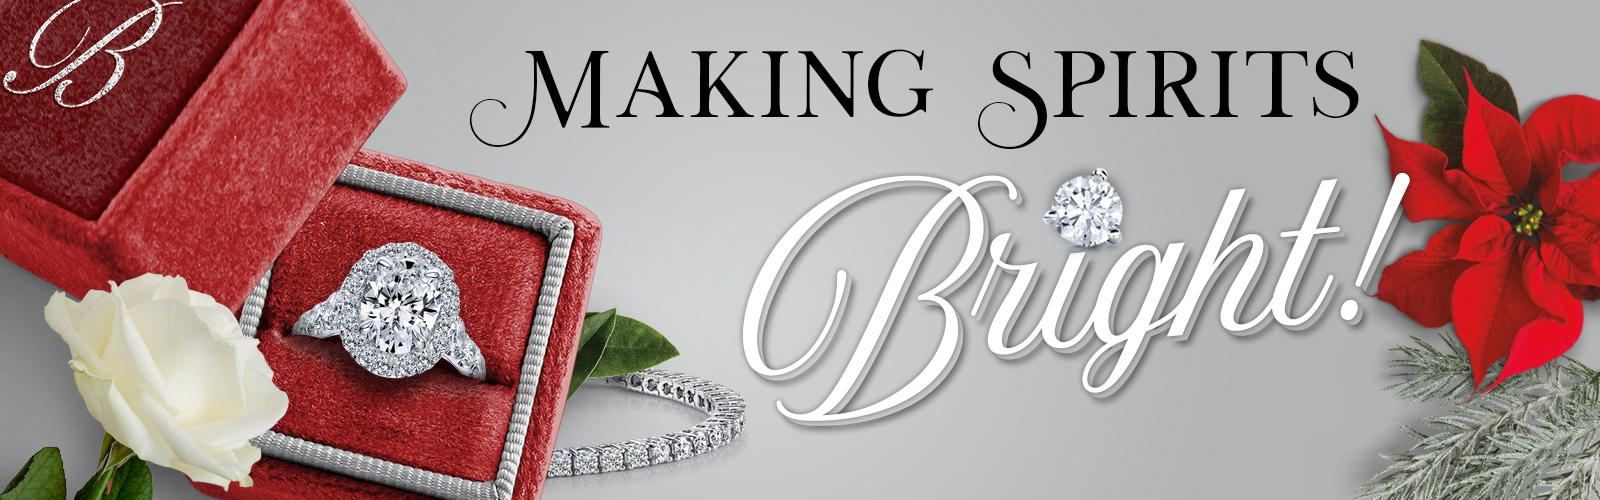 Bentley Diamond - Making Spirits Bright!